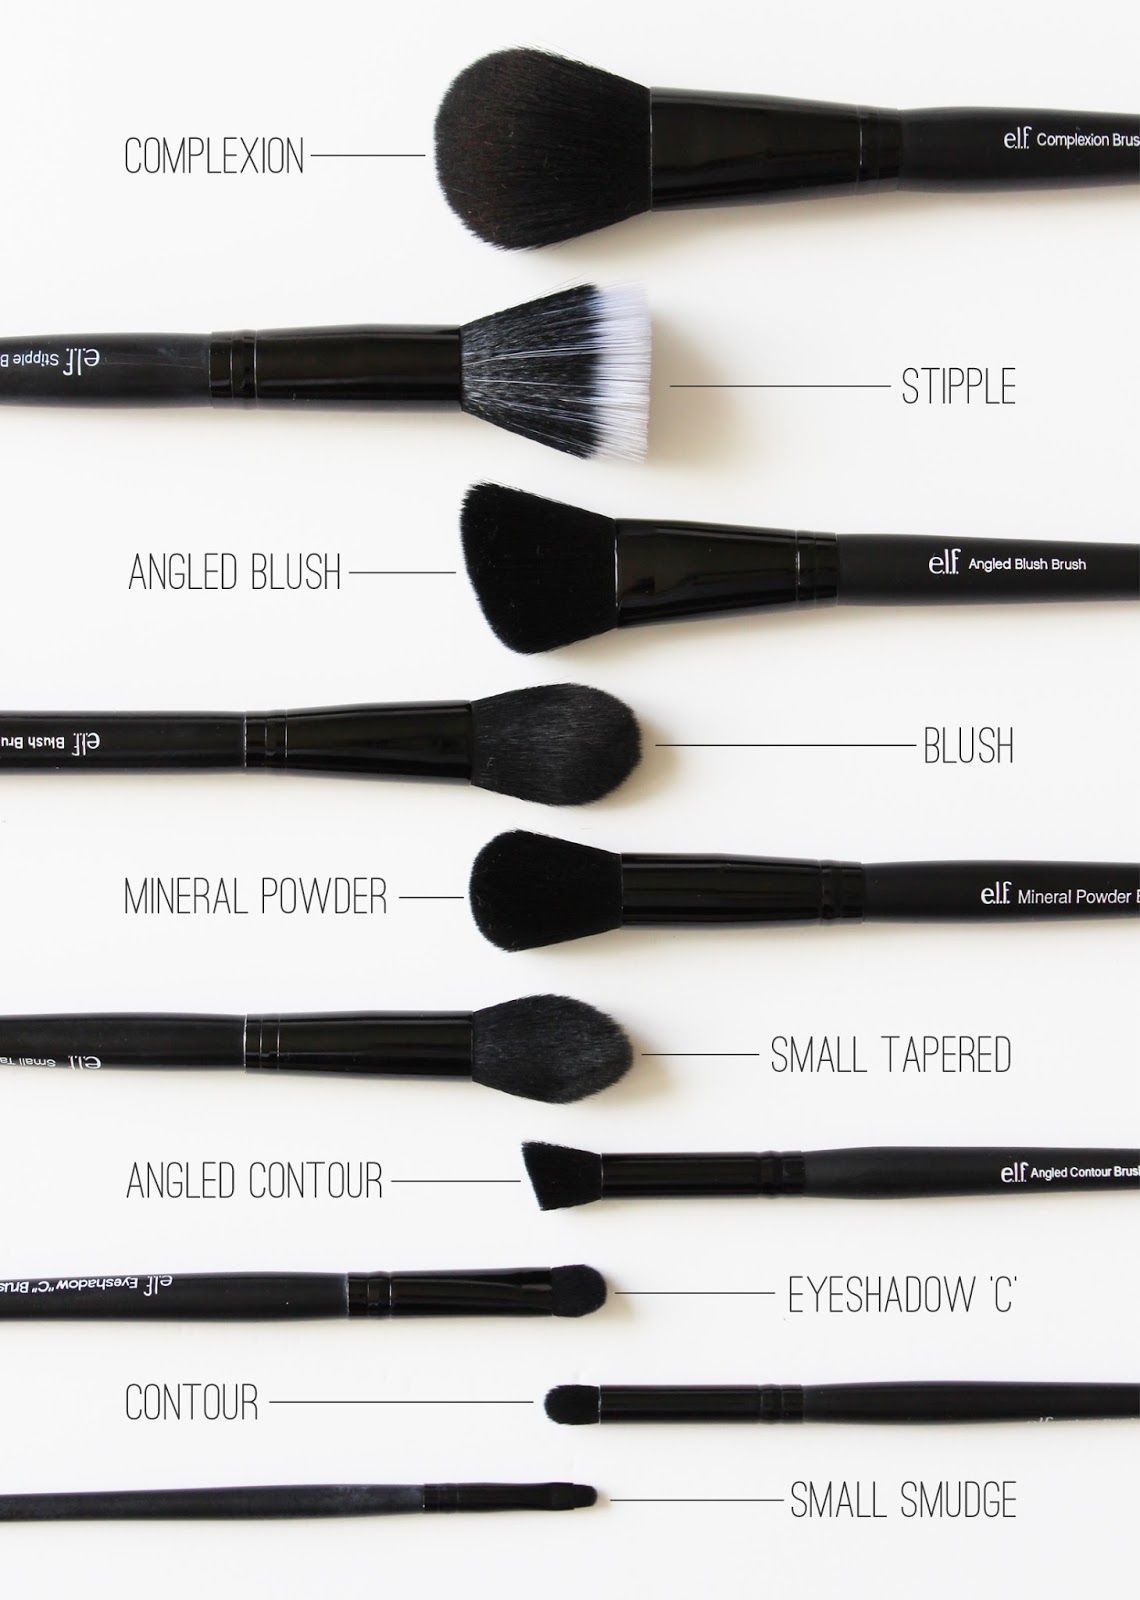 E.L.F. Skin makeup, Best makeup brushes, Makeup brushes